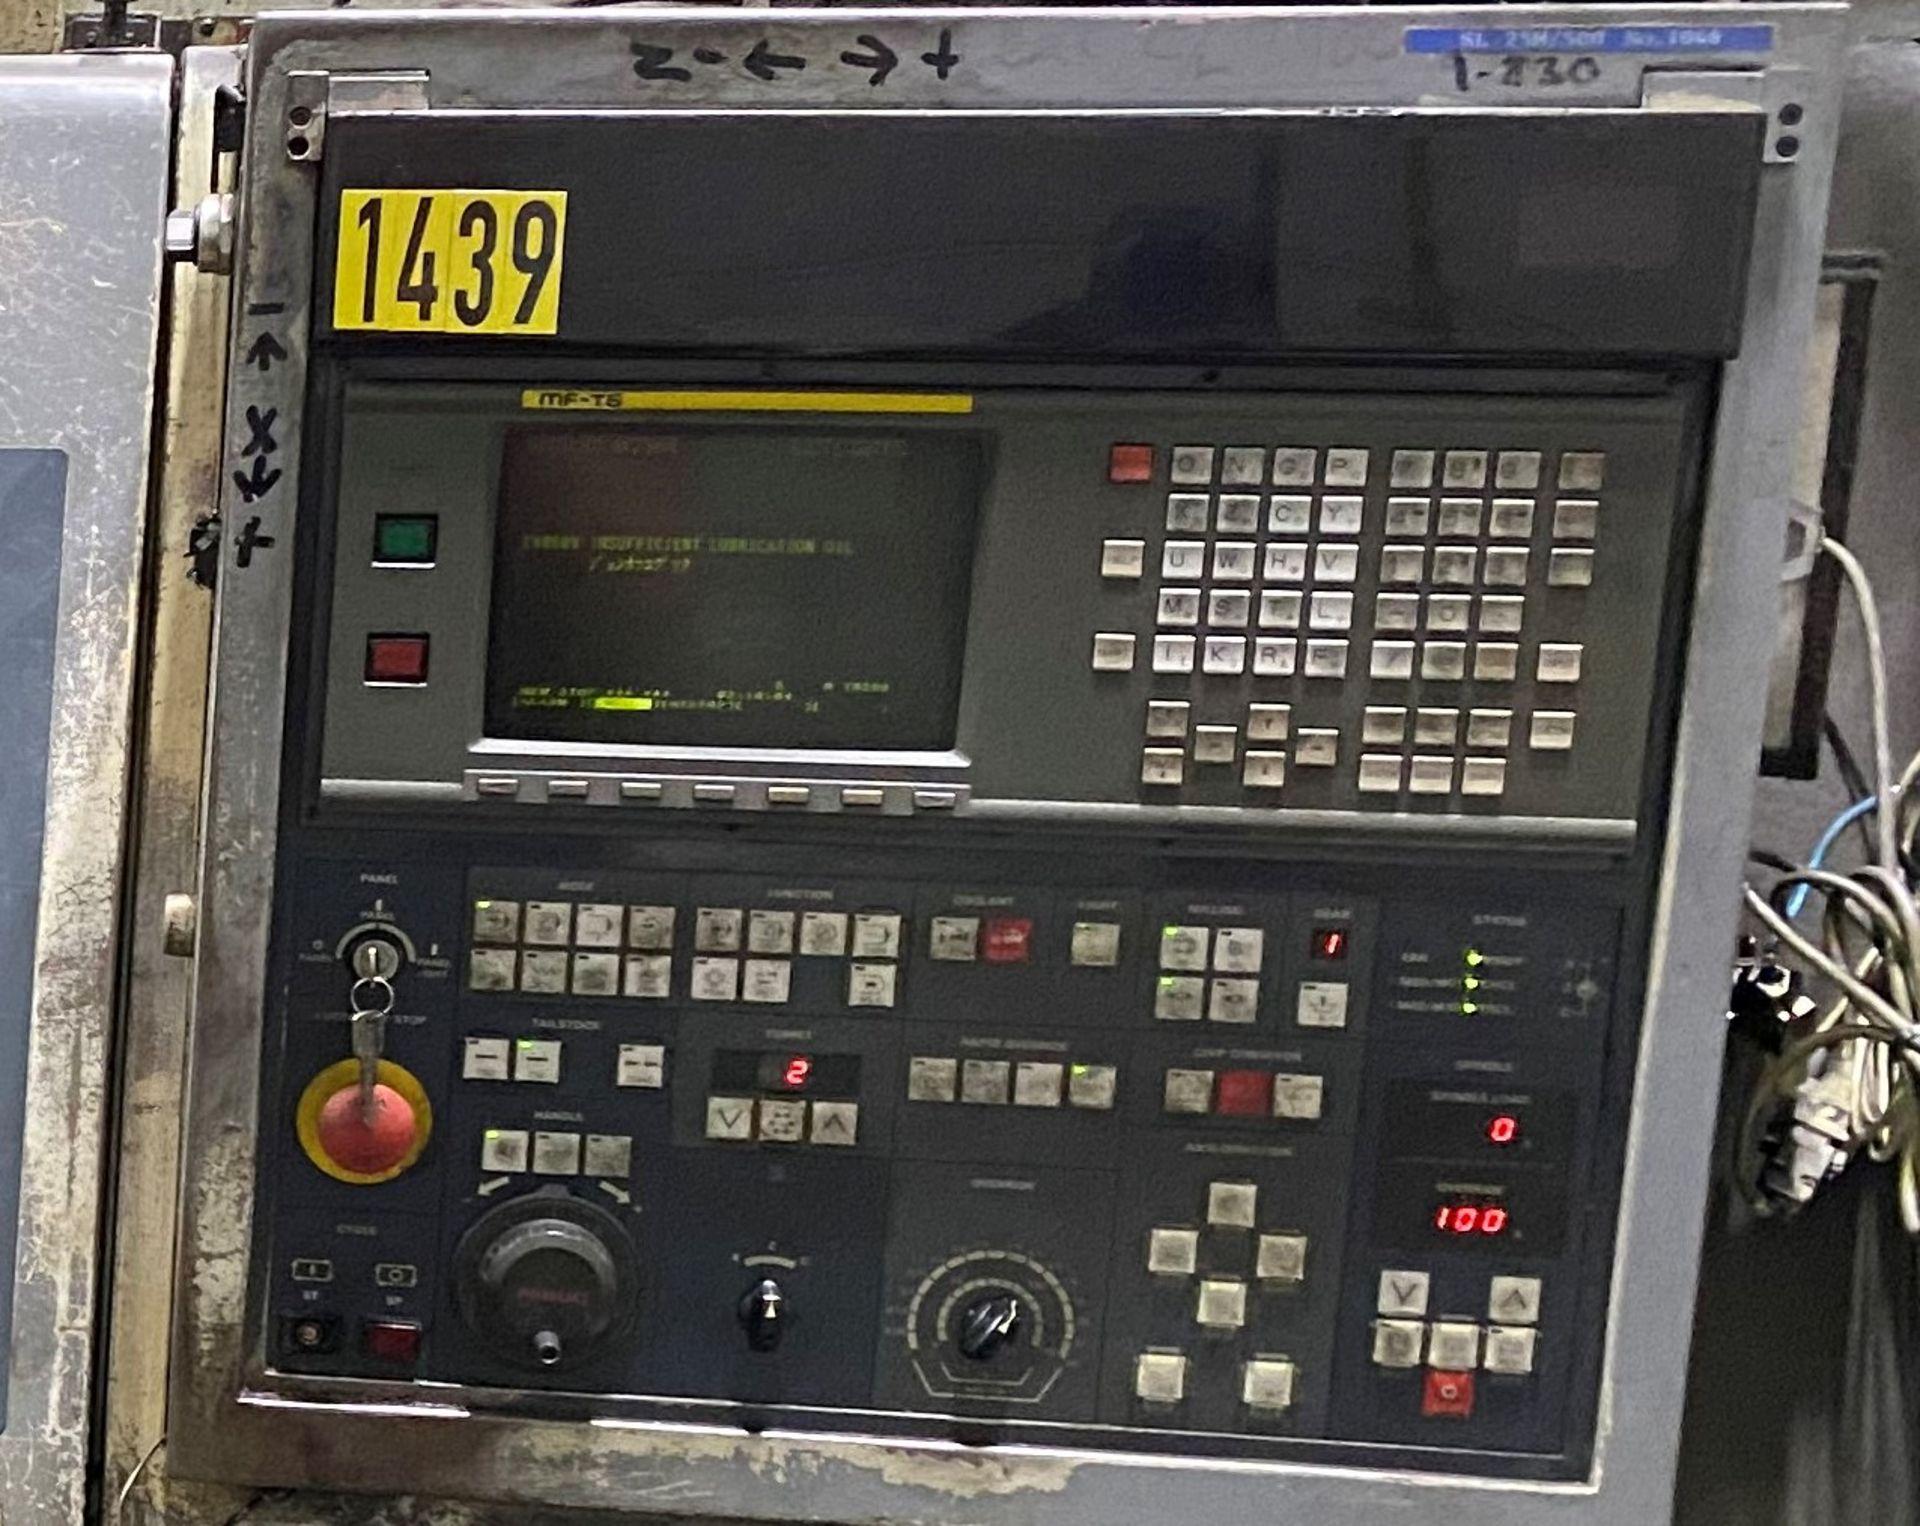 Mori Seiki SL-25M5 CNC Lathe - Image 2 of 8